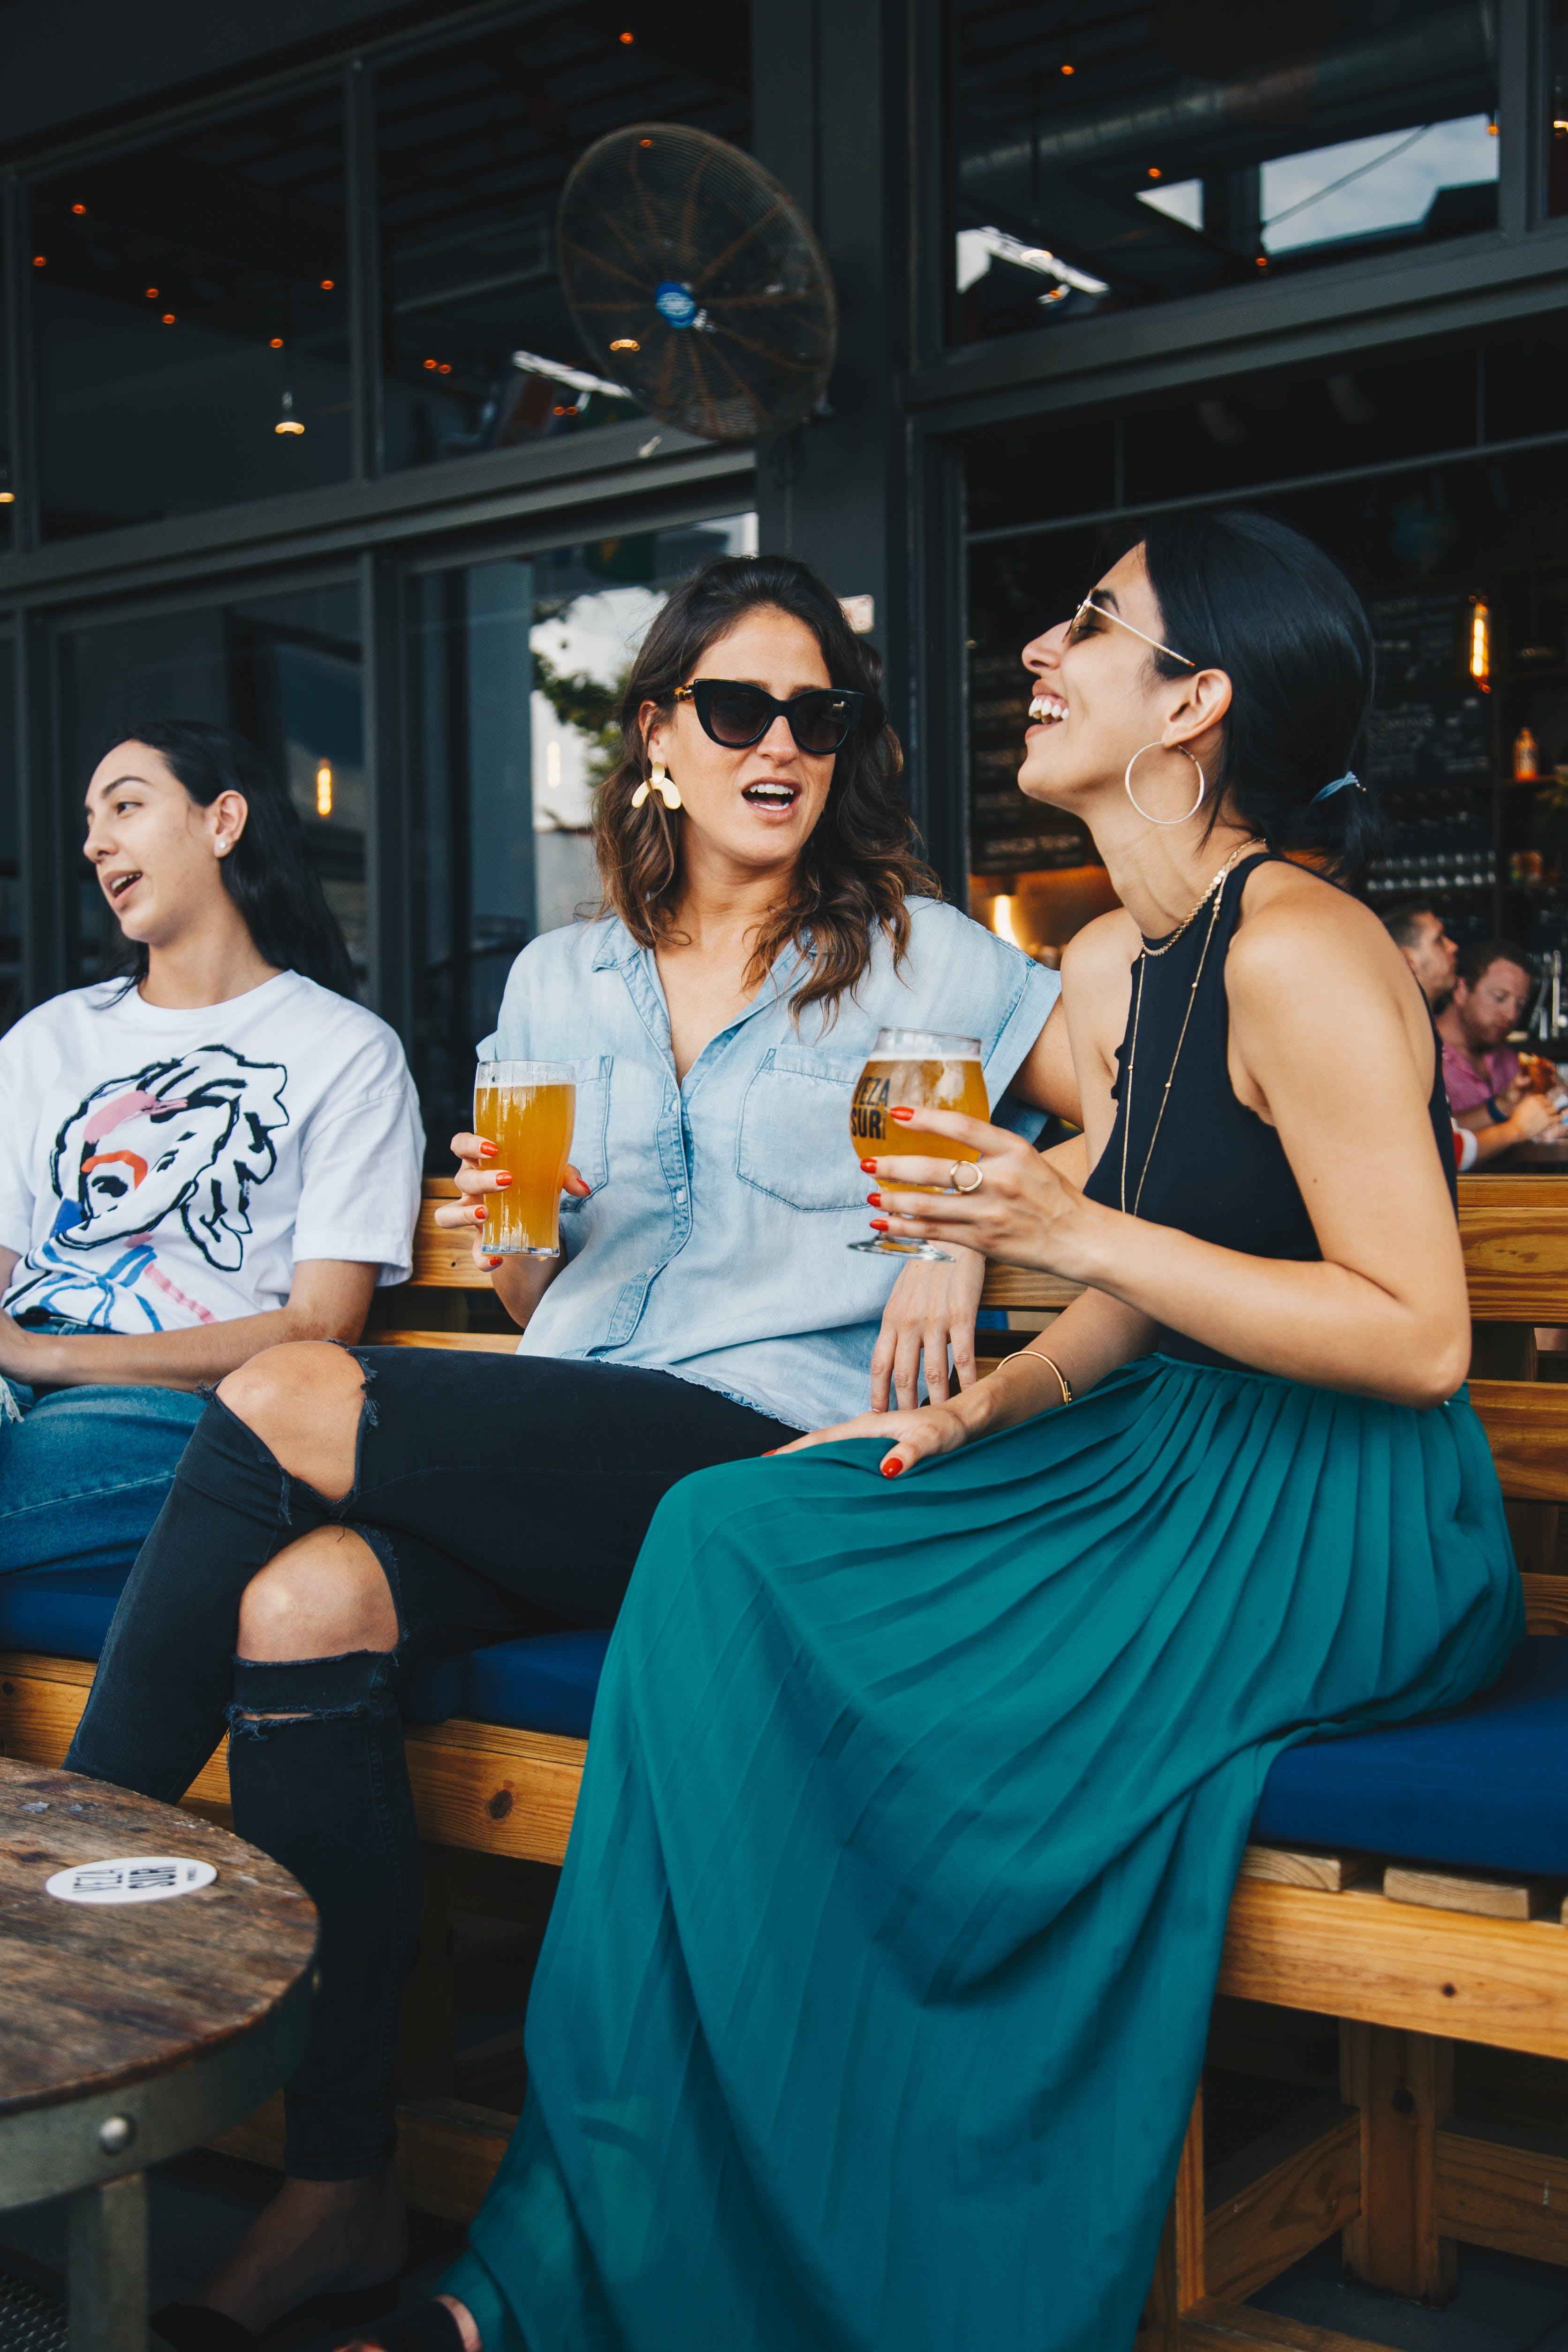 Women Sitting on Bench Restaurant